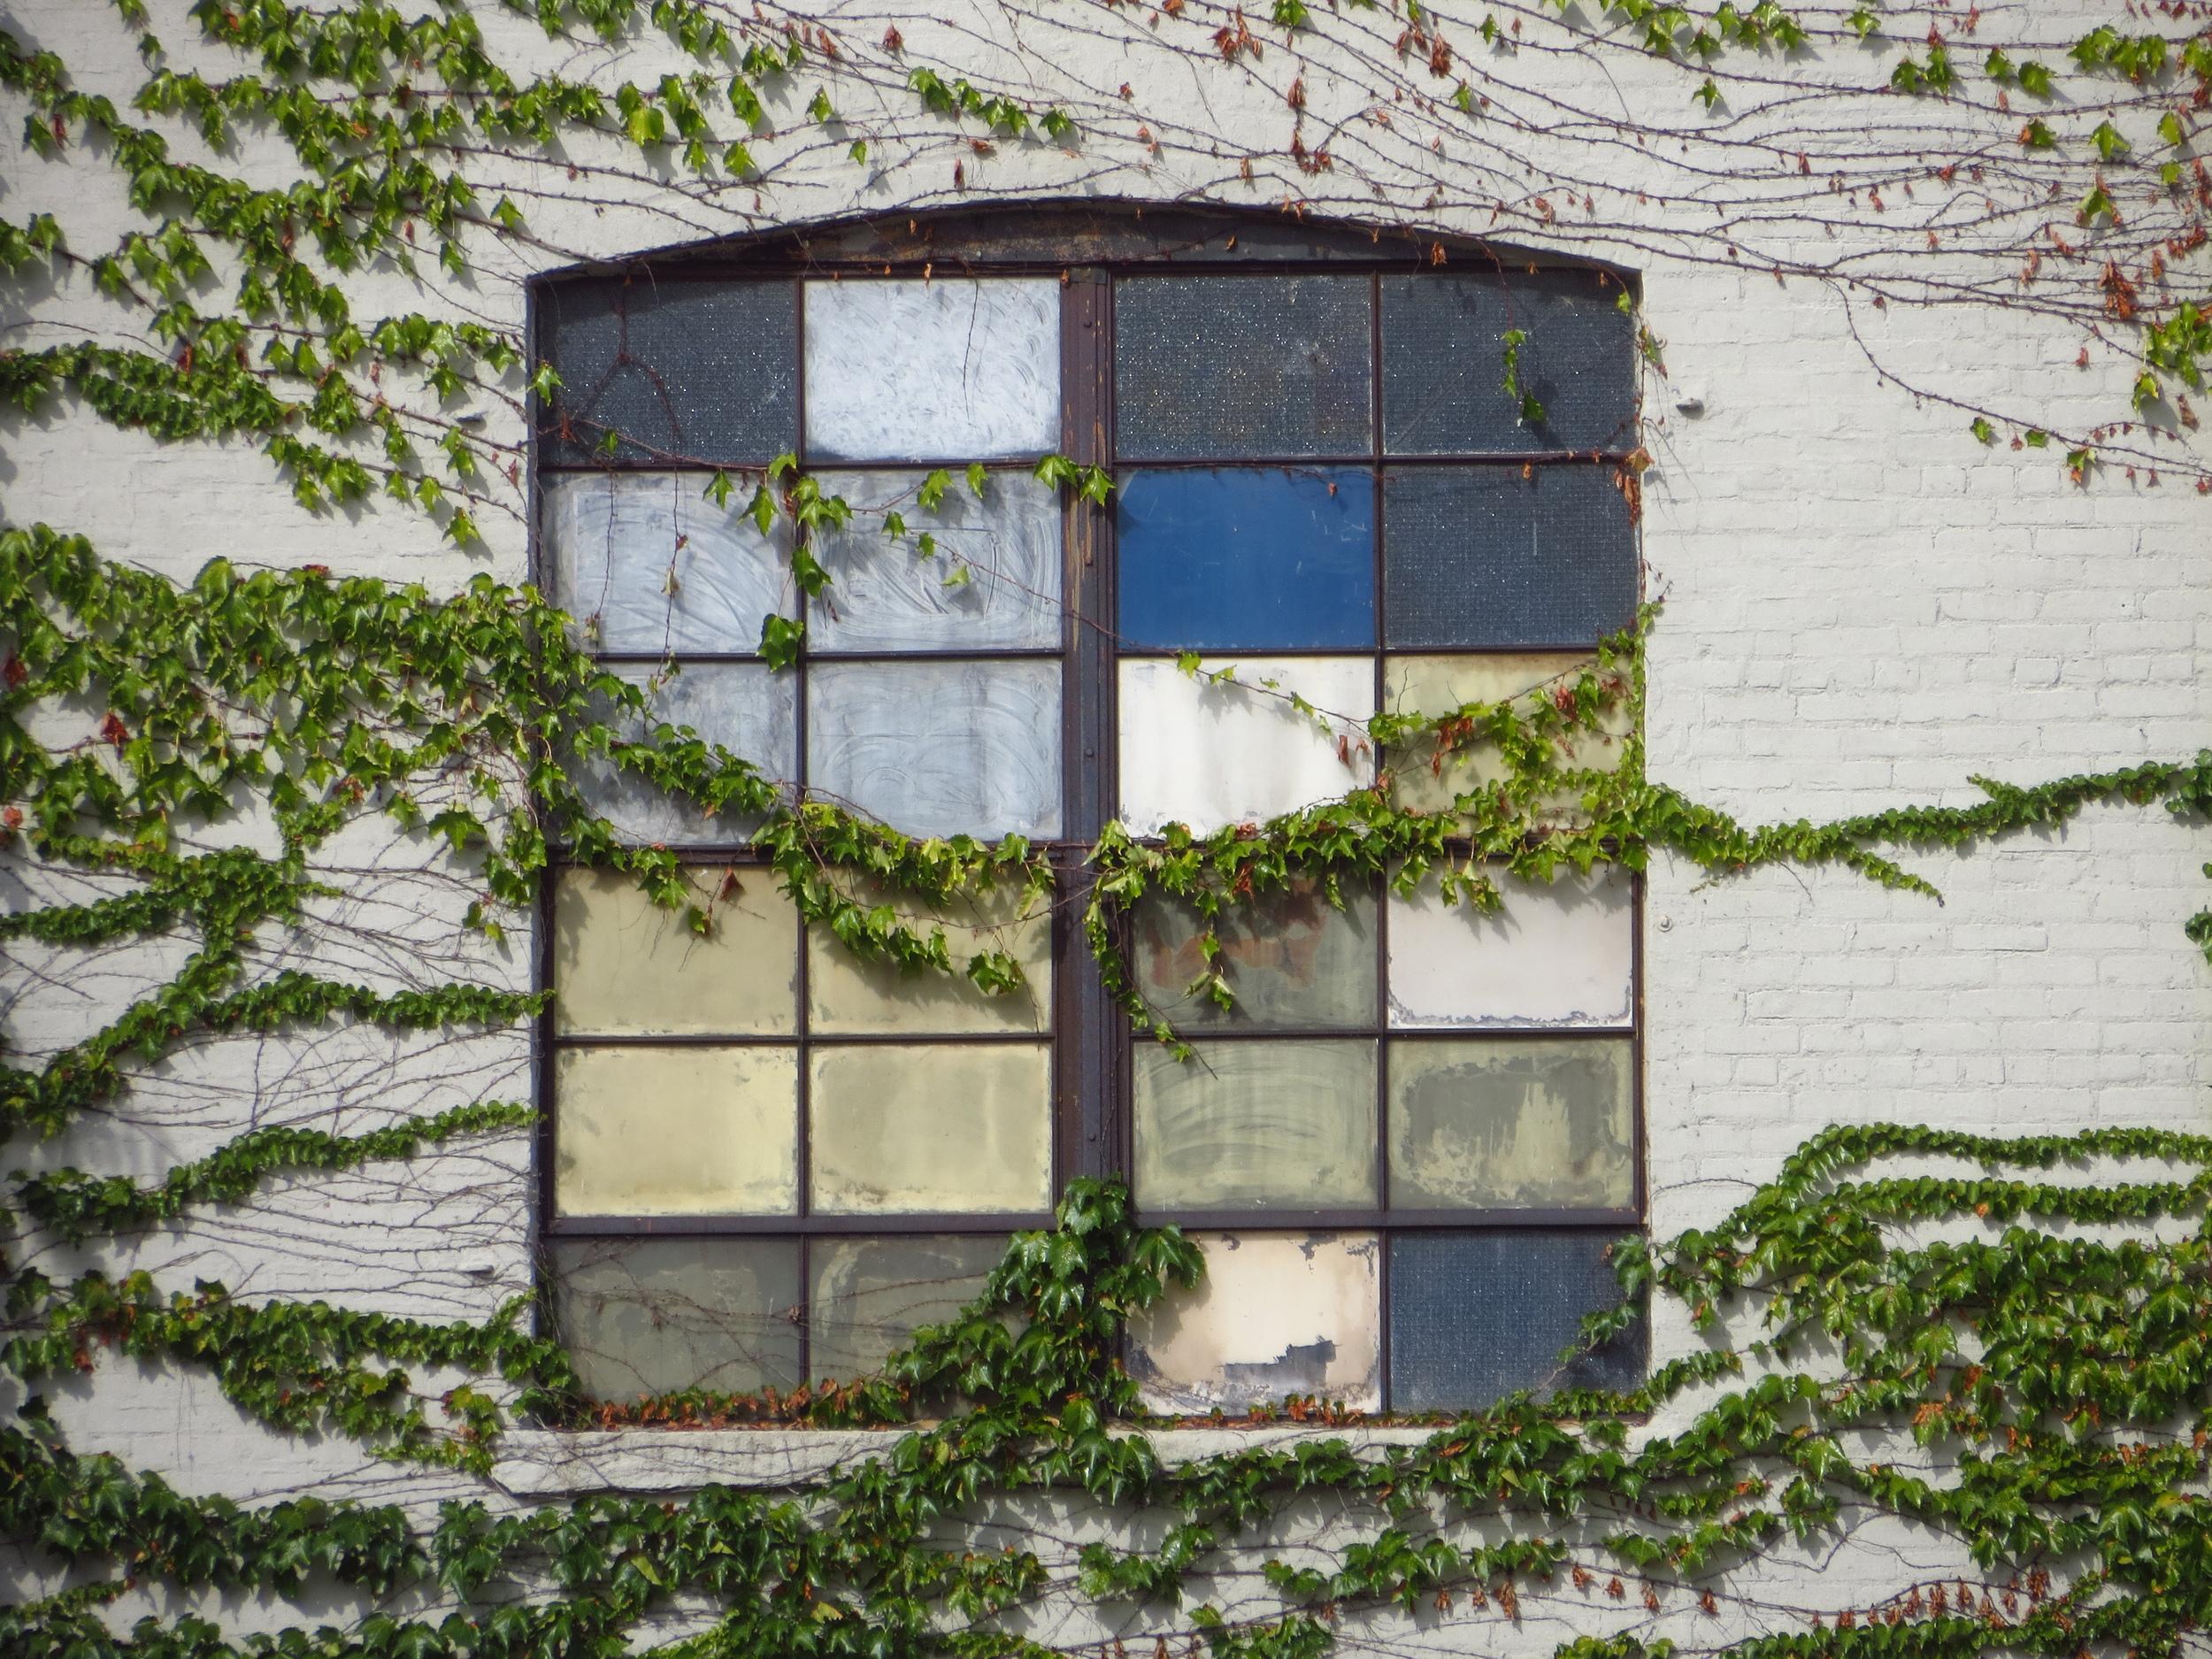 Vine-covered window